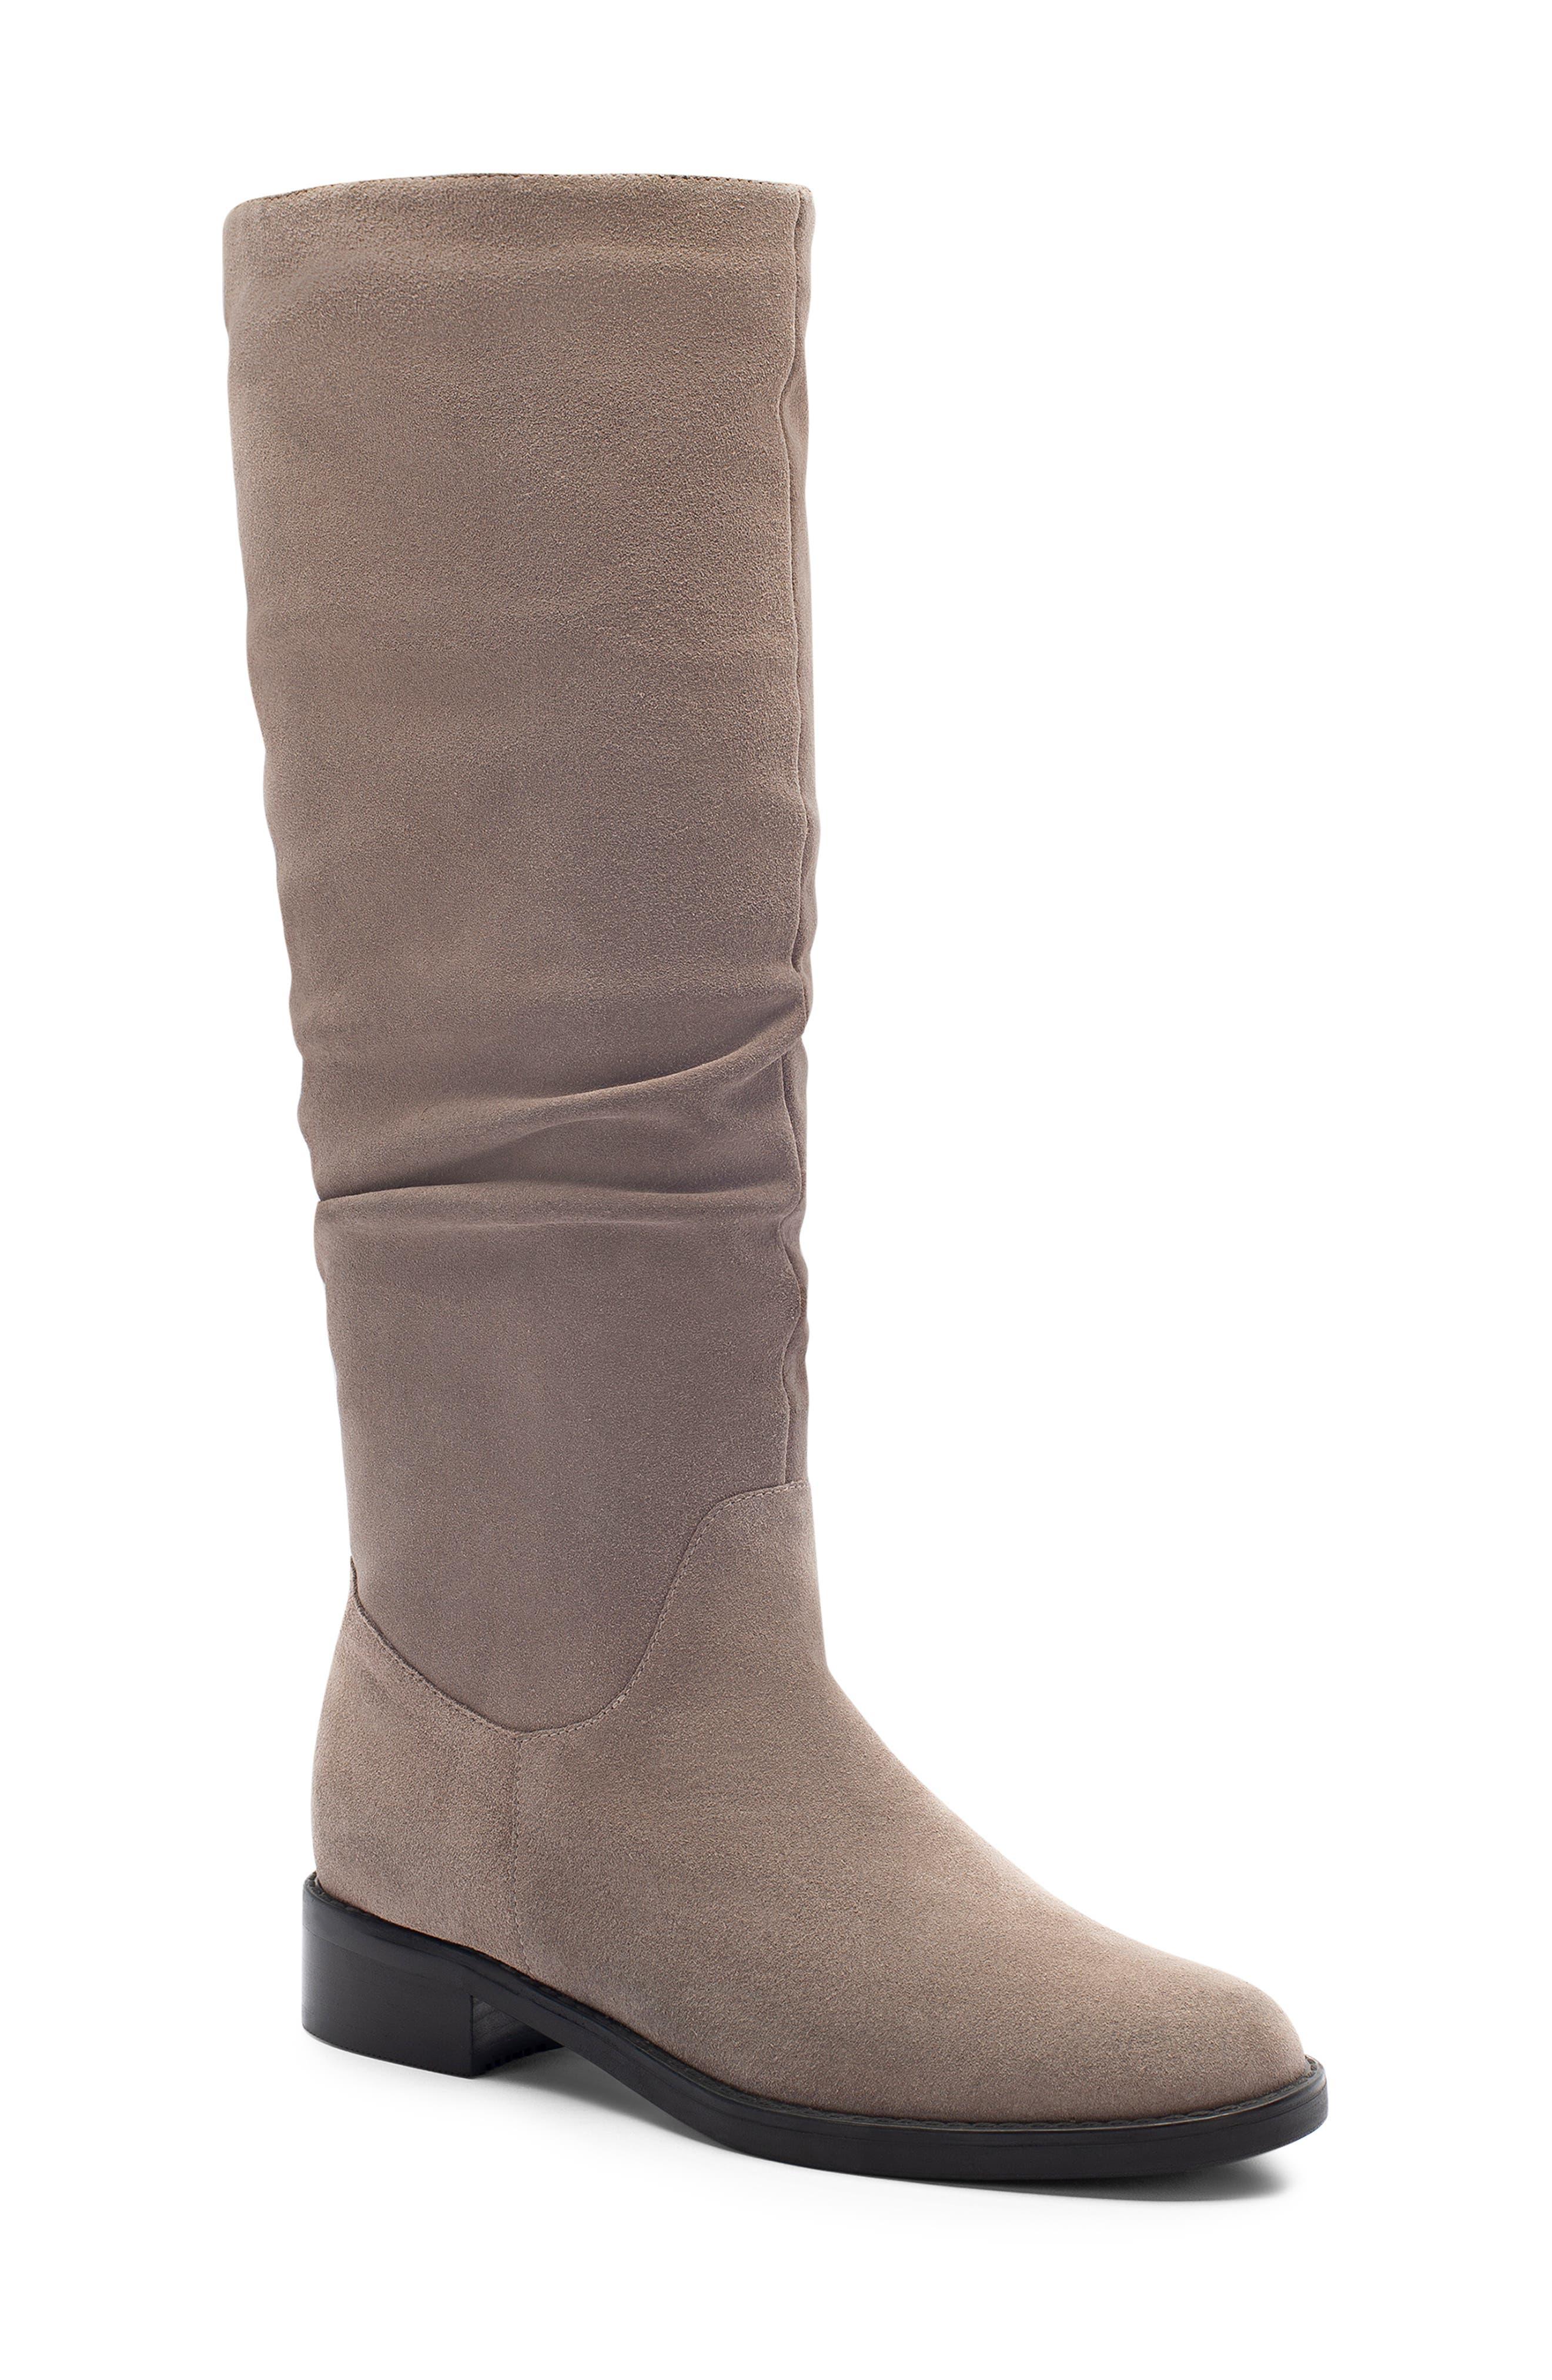 Erika Waterproof Knee High Boot, Main, color, DARK TAUPE SUEDE